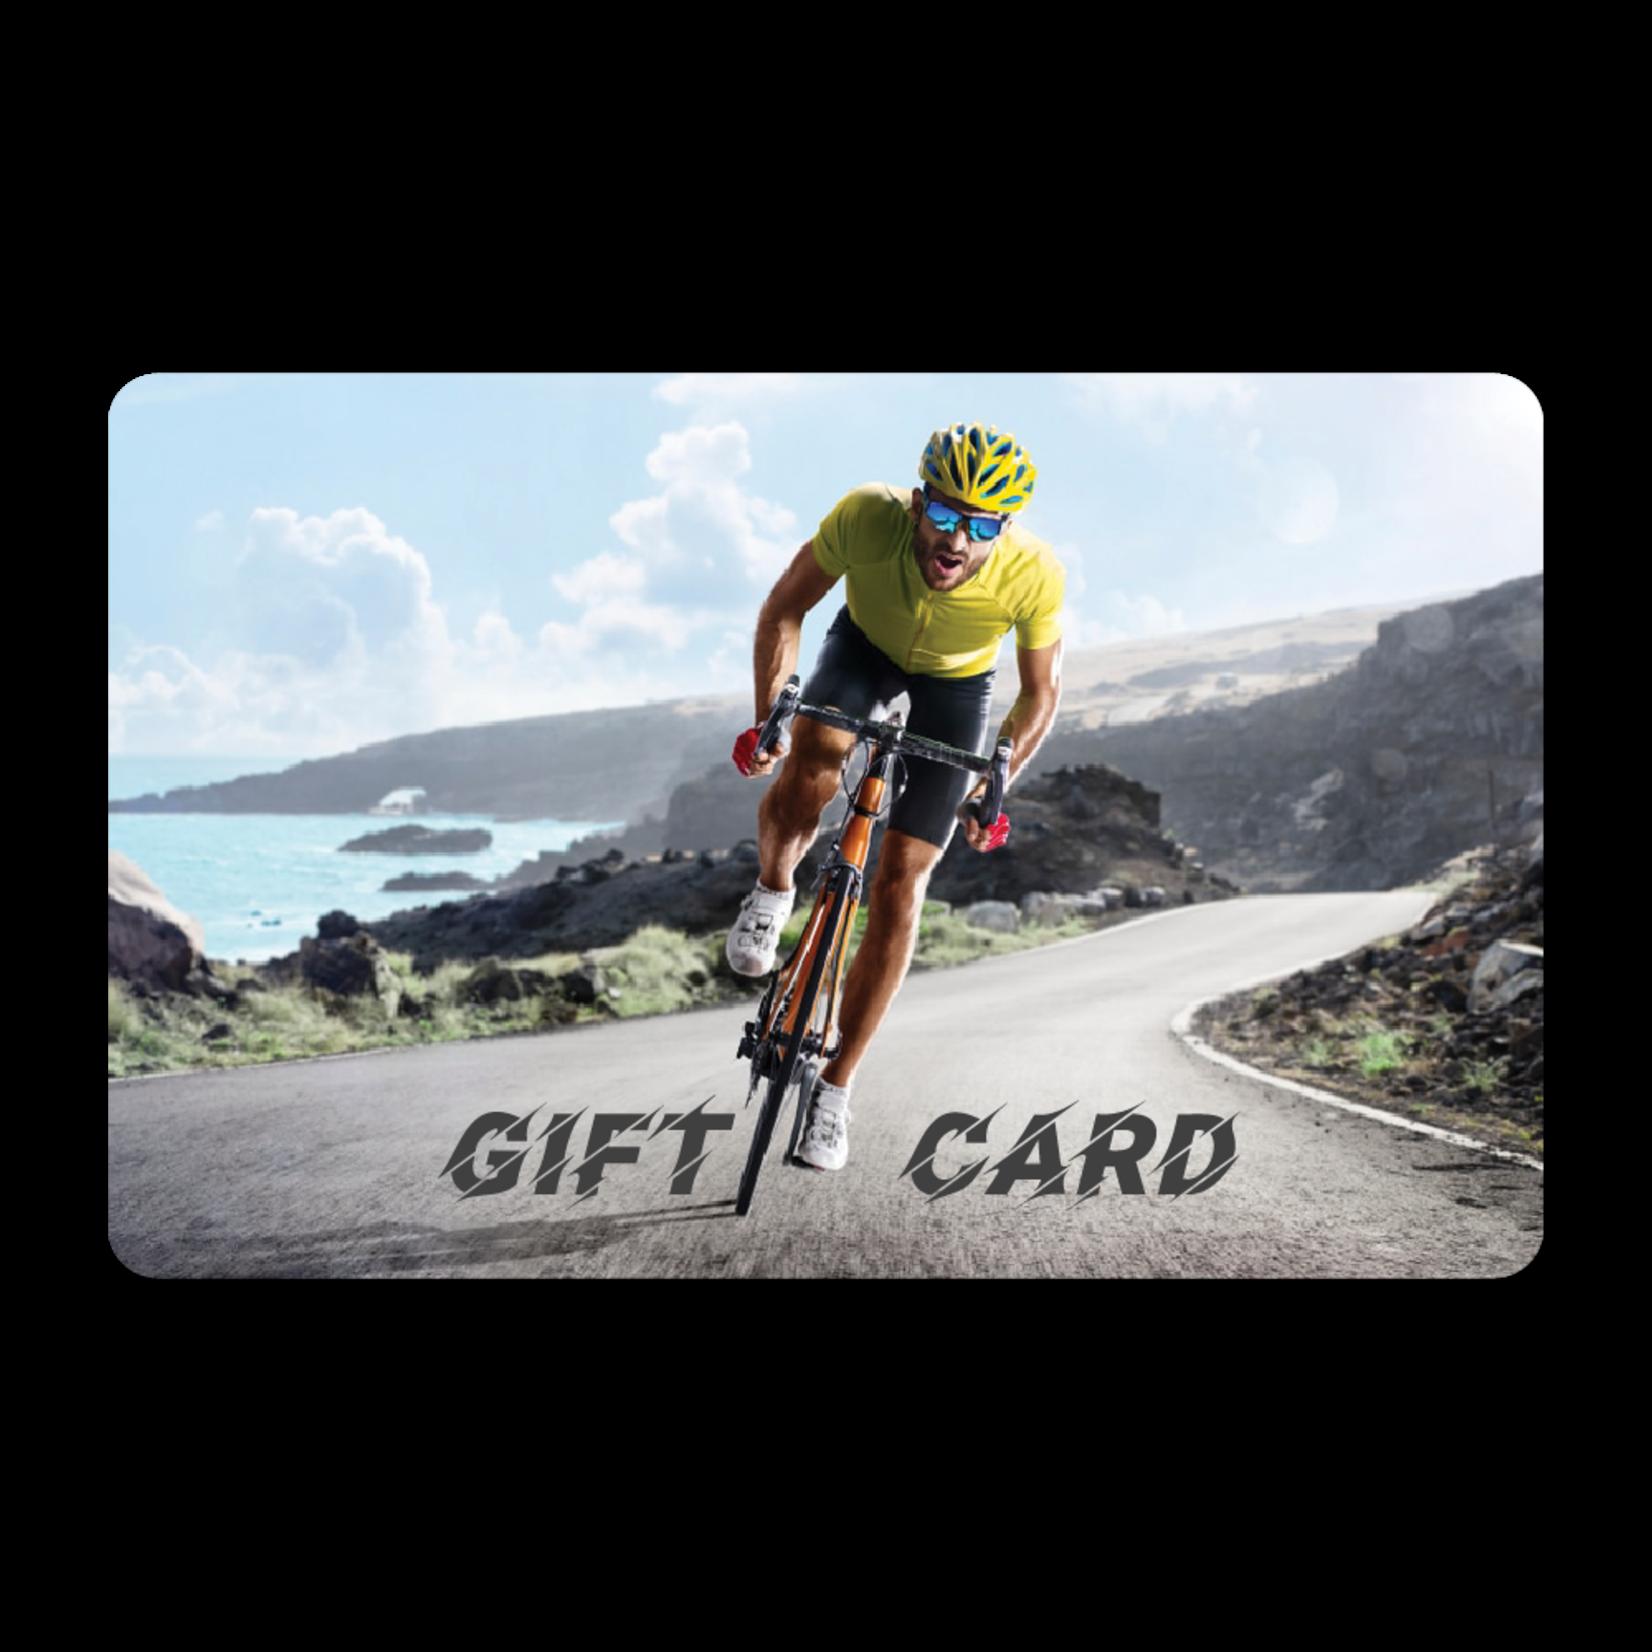 Gift Cards - Mountain Biking